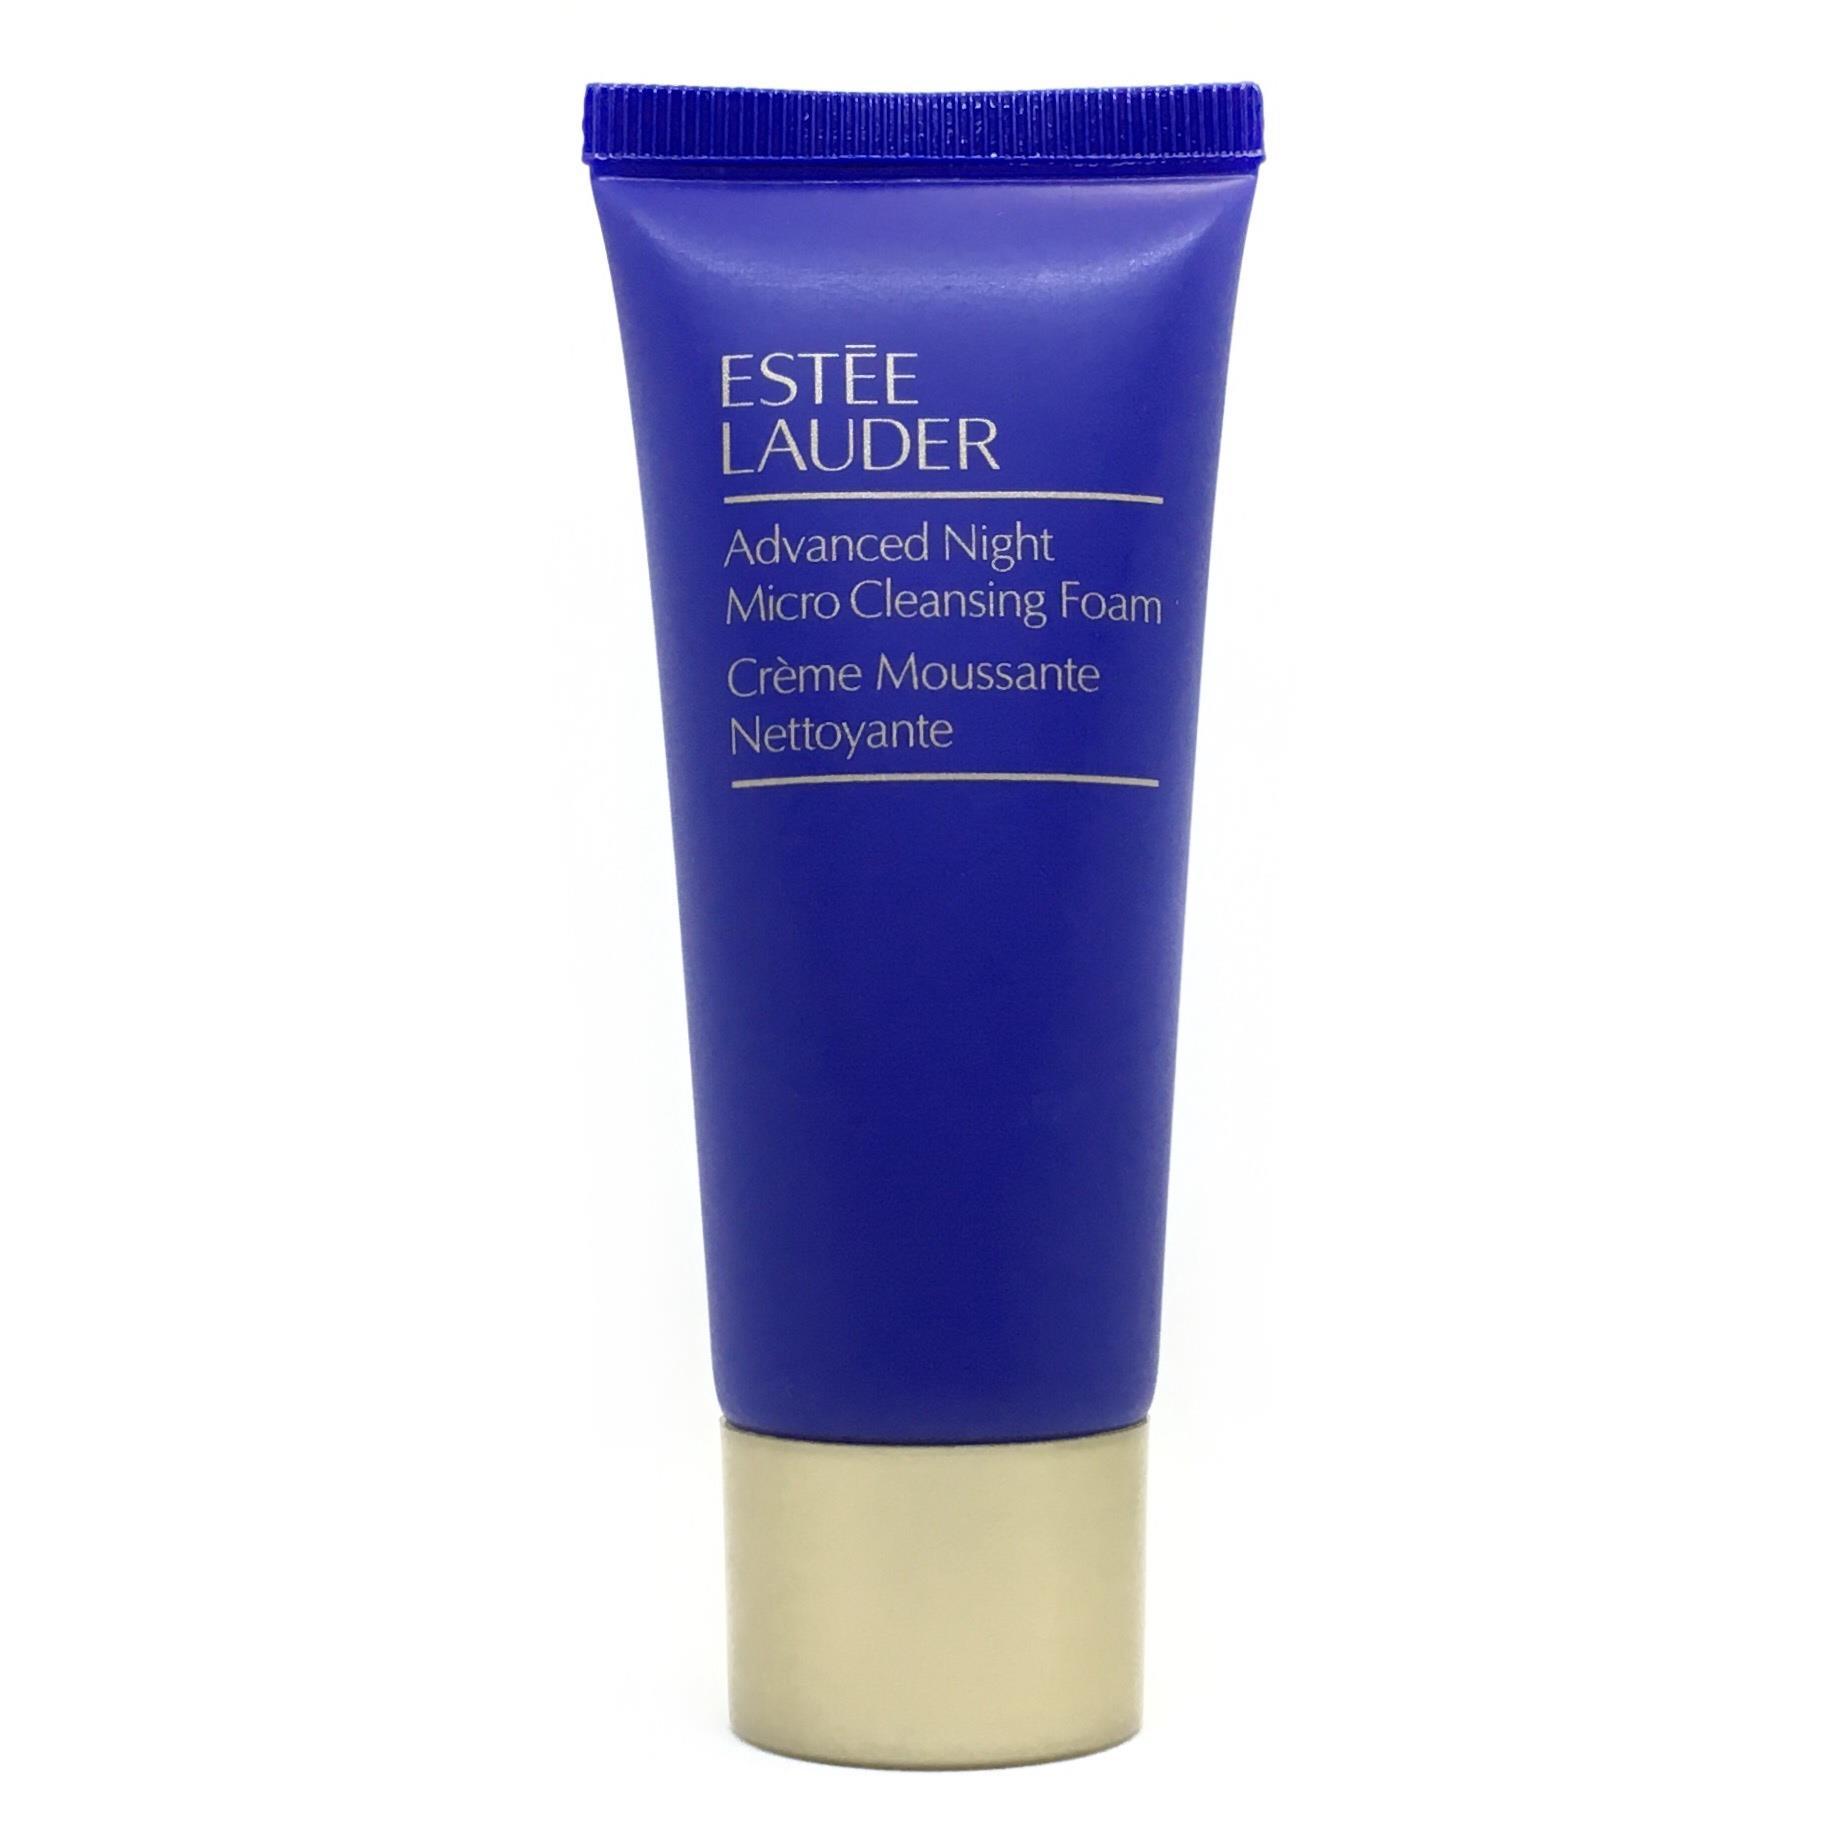 Sua rua mat Estee Lauder Advanced Night Micro Cleansing Foam 30ml SIRO Cosmetic